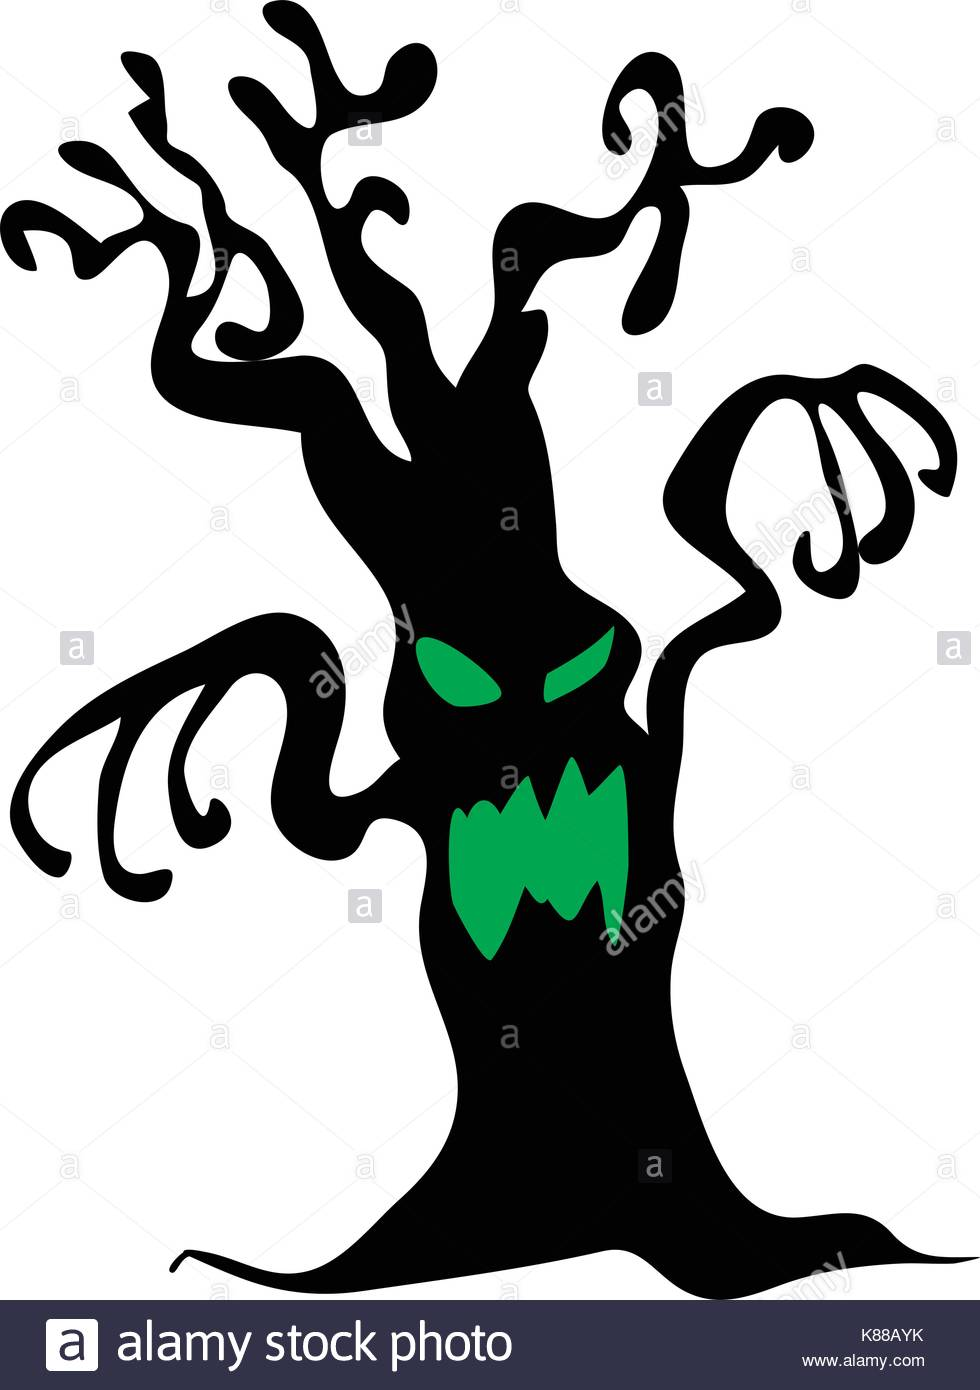 980x1390 Halloween Creepy Scary Bare Tree Monster Vector Symbol Icon Design